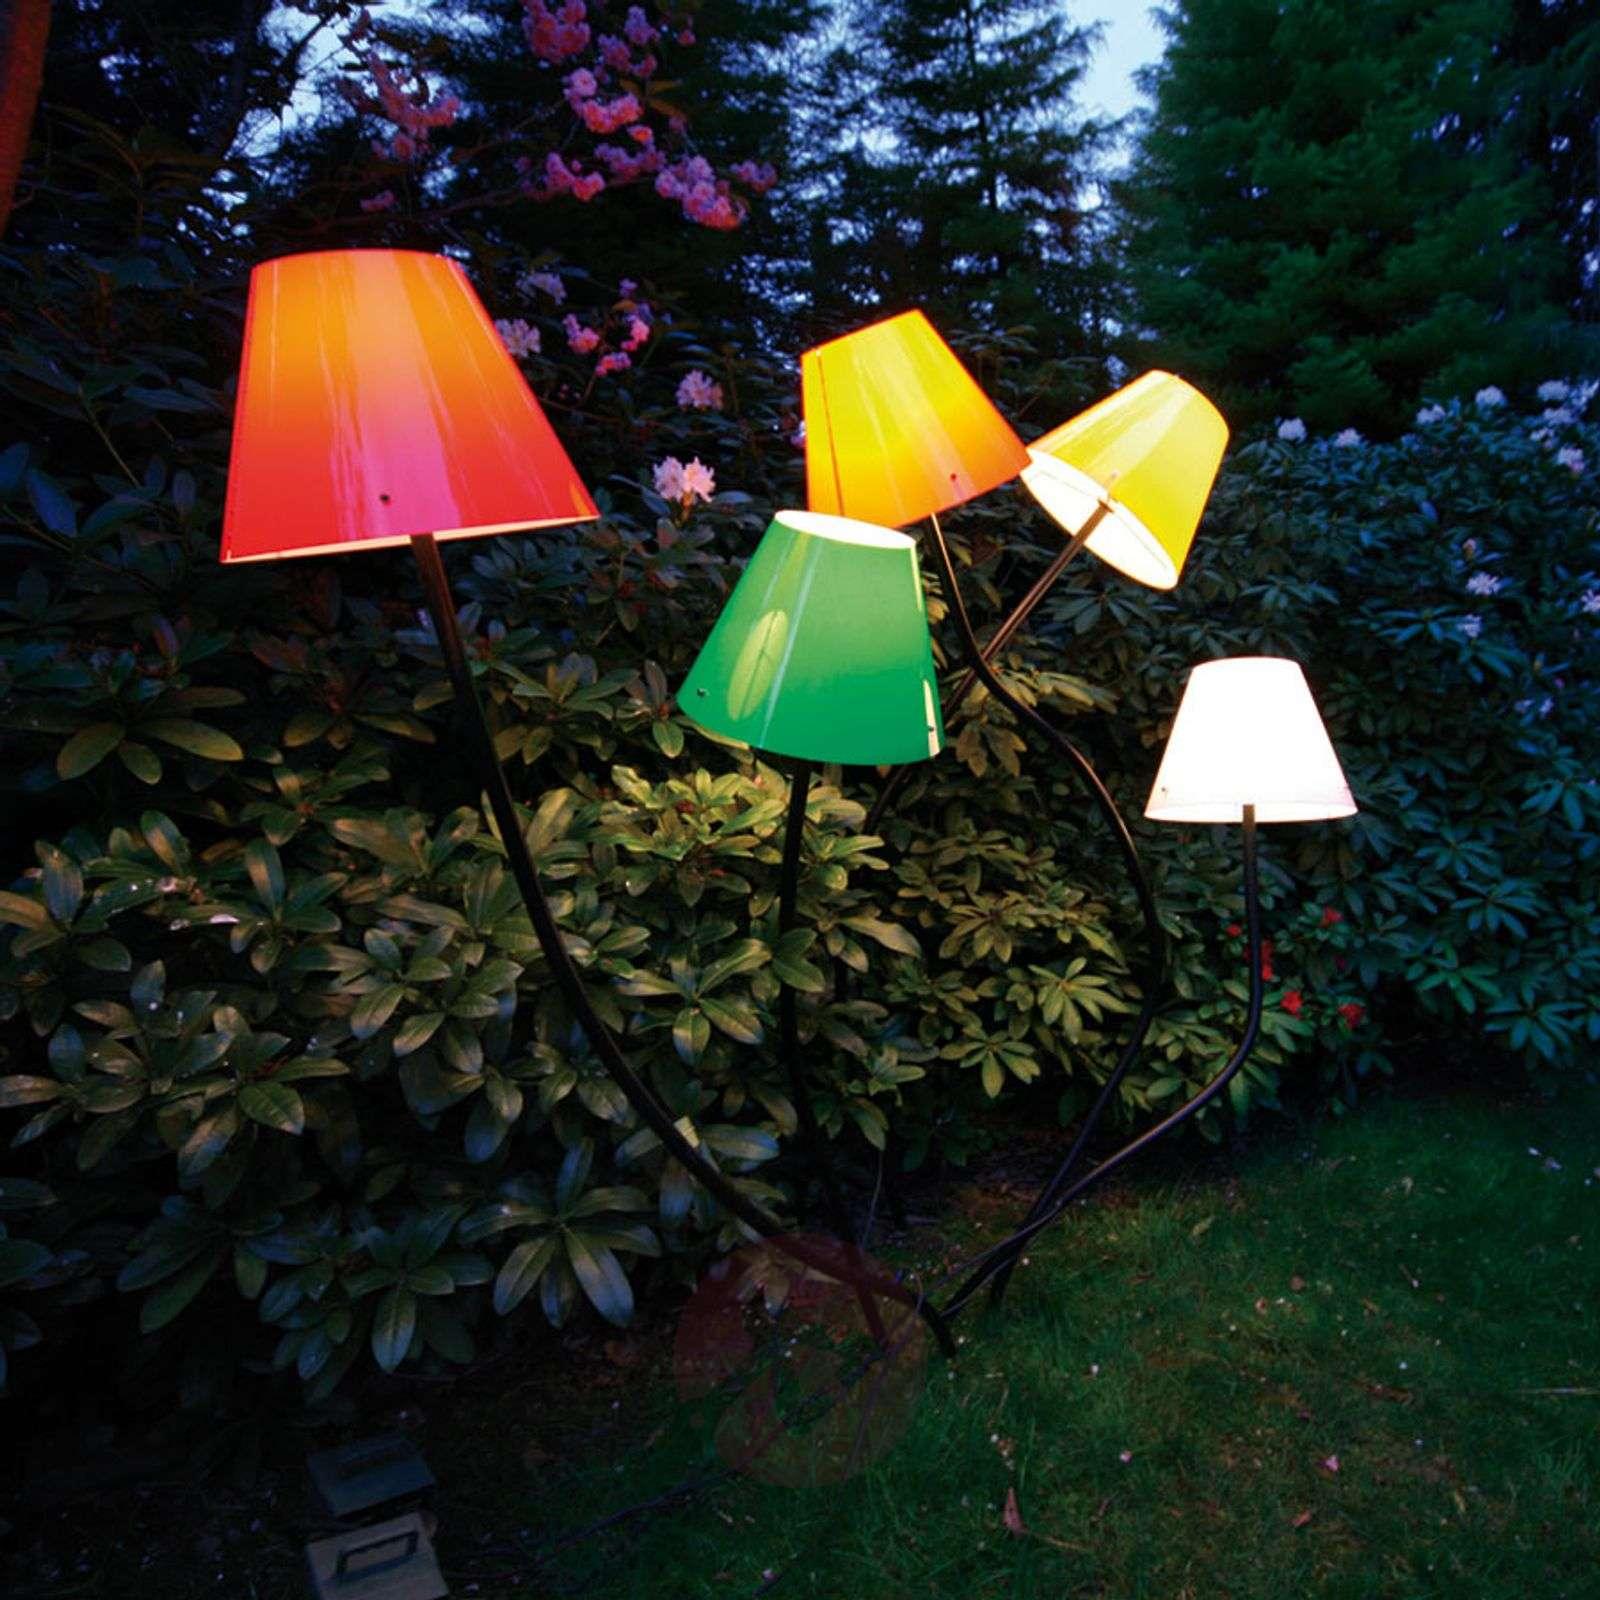 Outdoor light Octopus Outdoor, no lampshade-9020041X-01